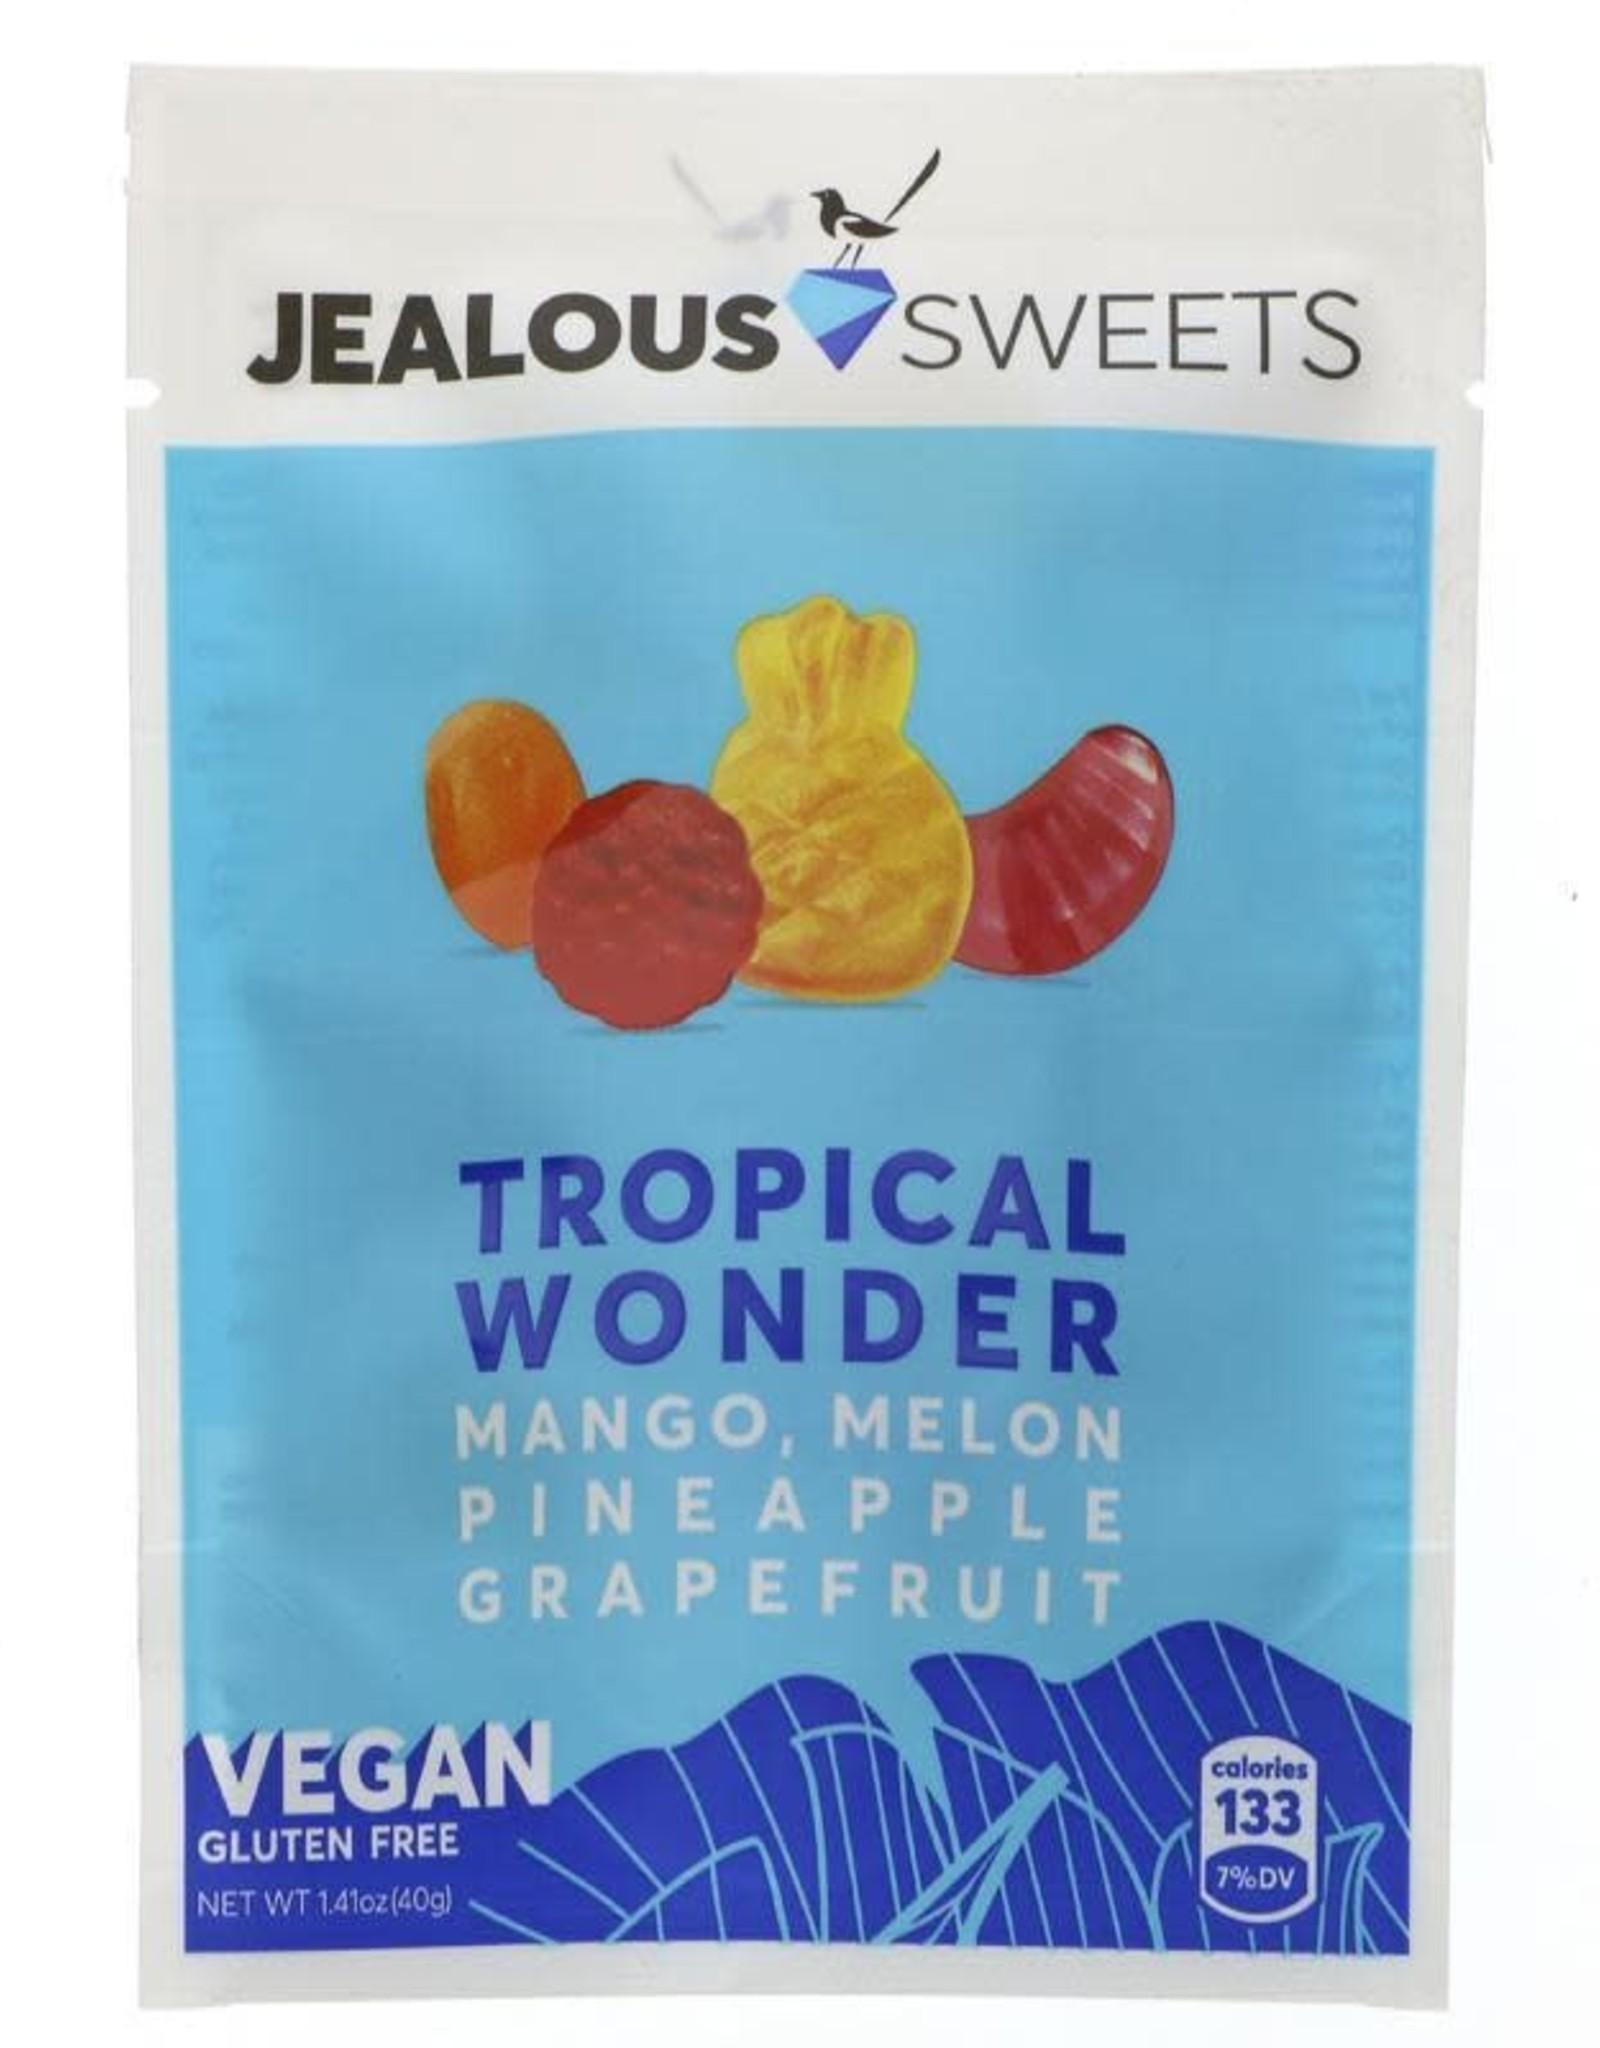 Jealous Sweets Jealous Sweets Tropical Wonder 125g